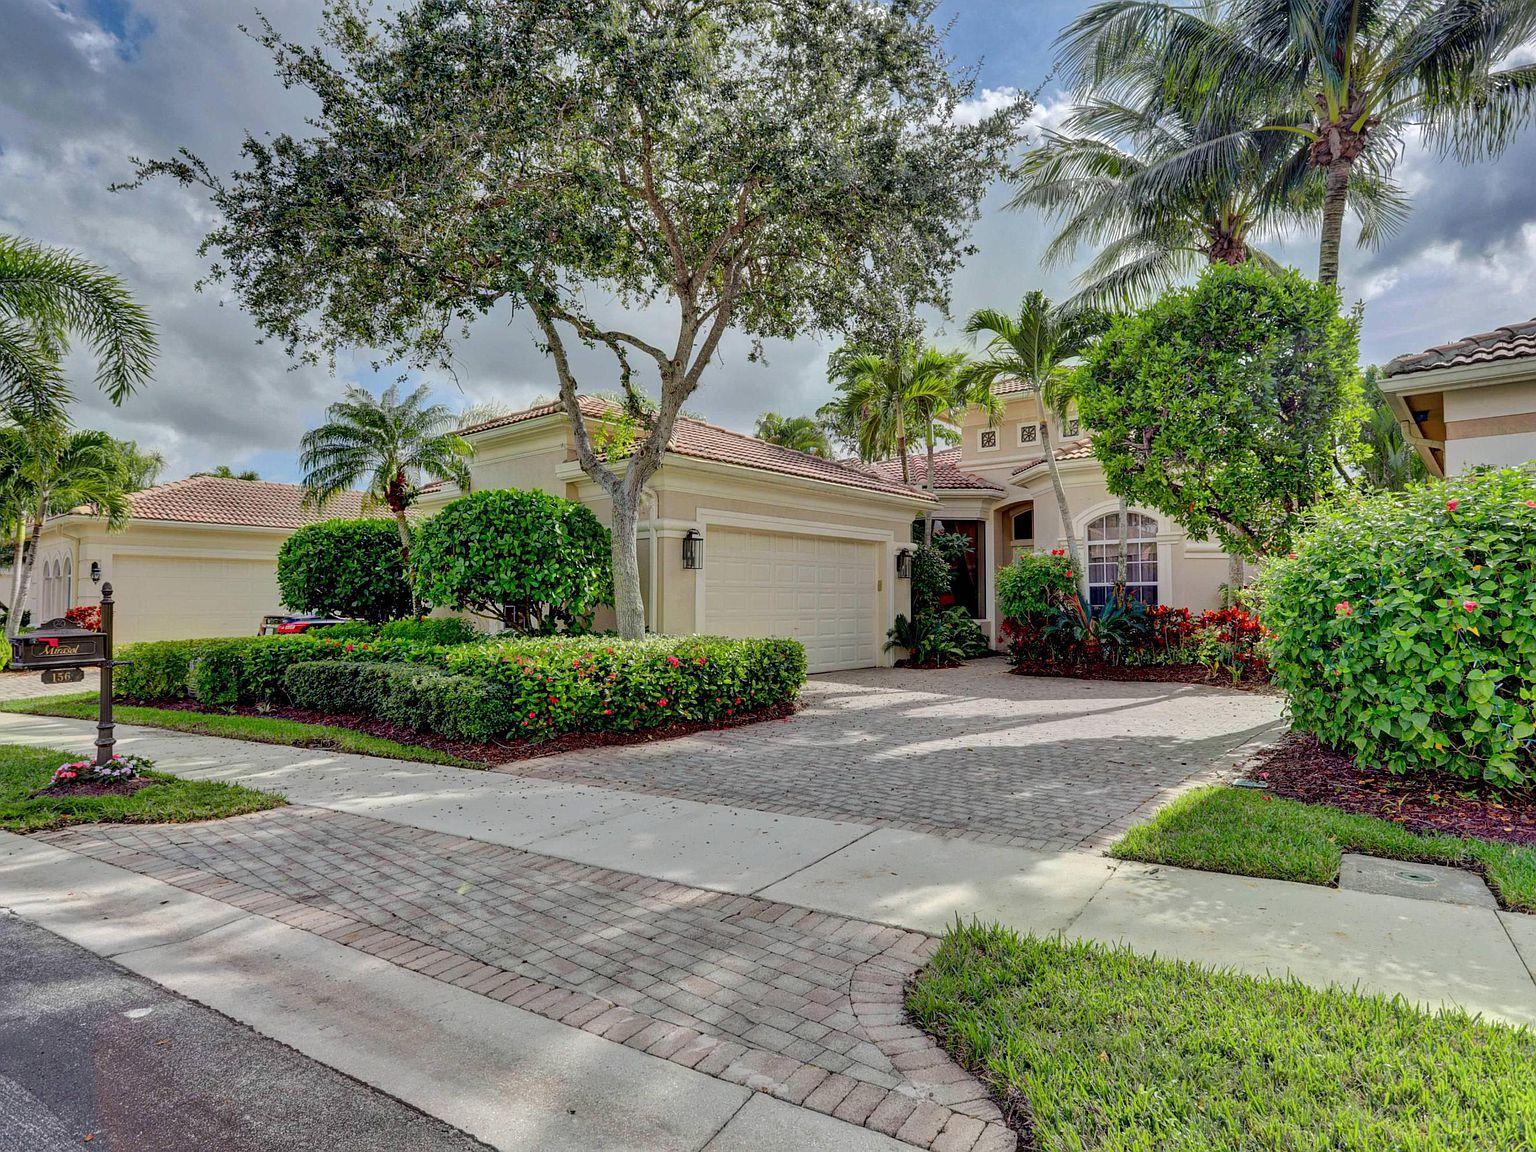 60c965d5fdd6484d18026cc2e8d8f51a cc ft 1536 - Horseshoe Acres Palm Beach Gardens Hoa